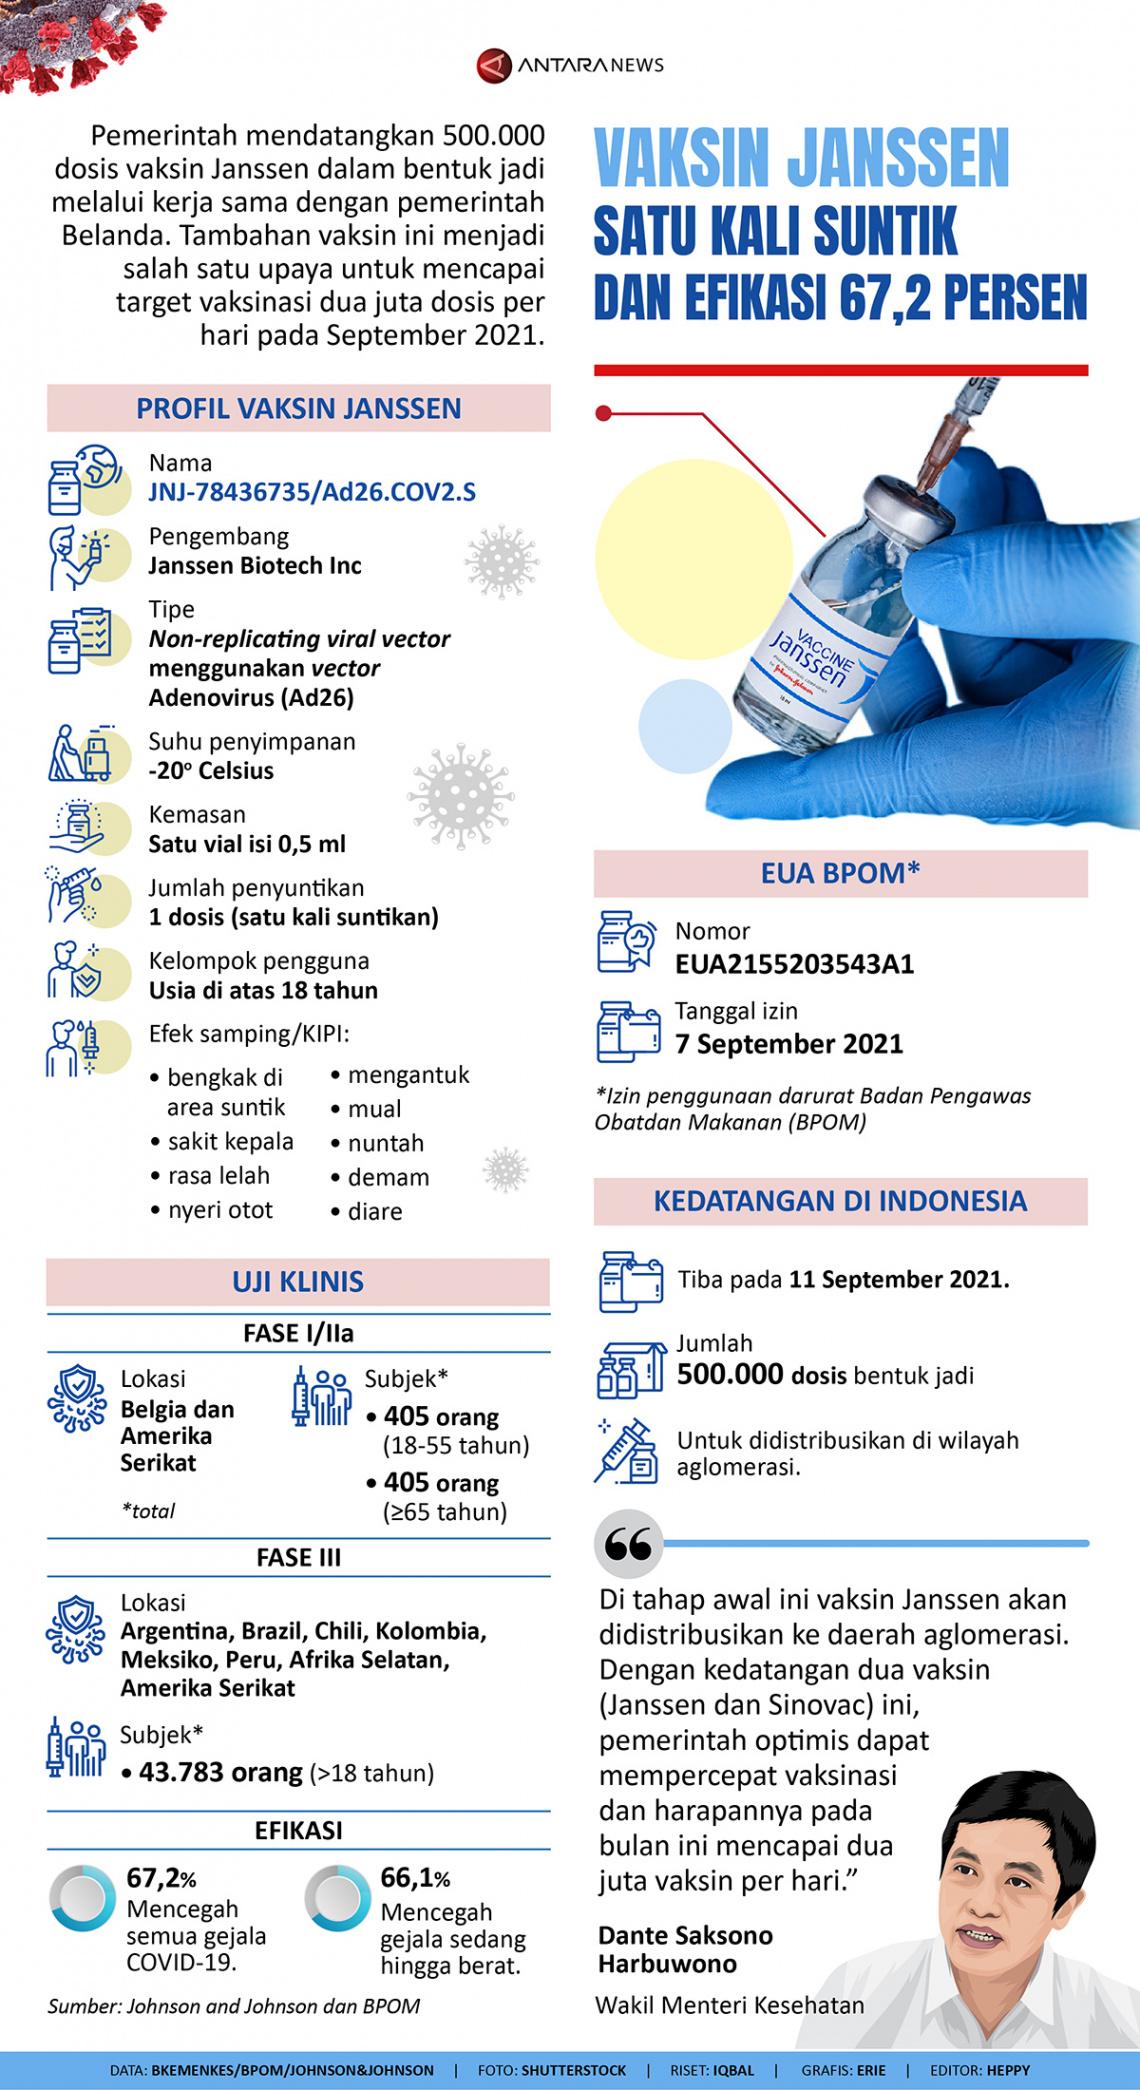 Vaksin Janssen: Satu kali suntik dan efikasi 67,2 persen